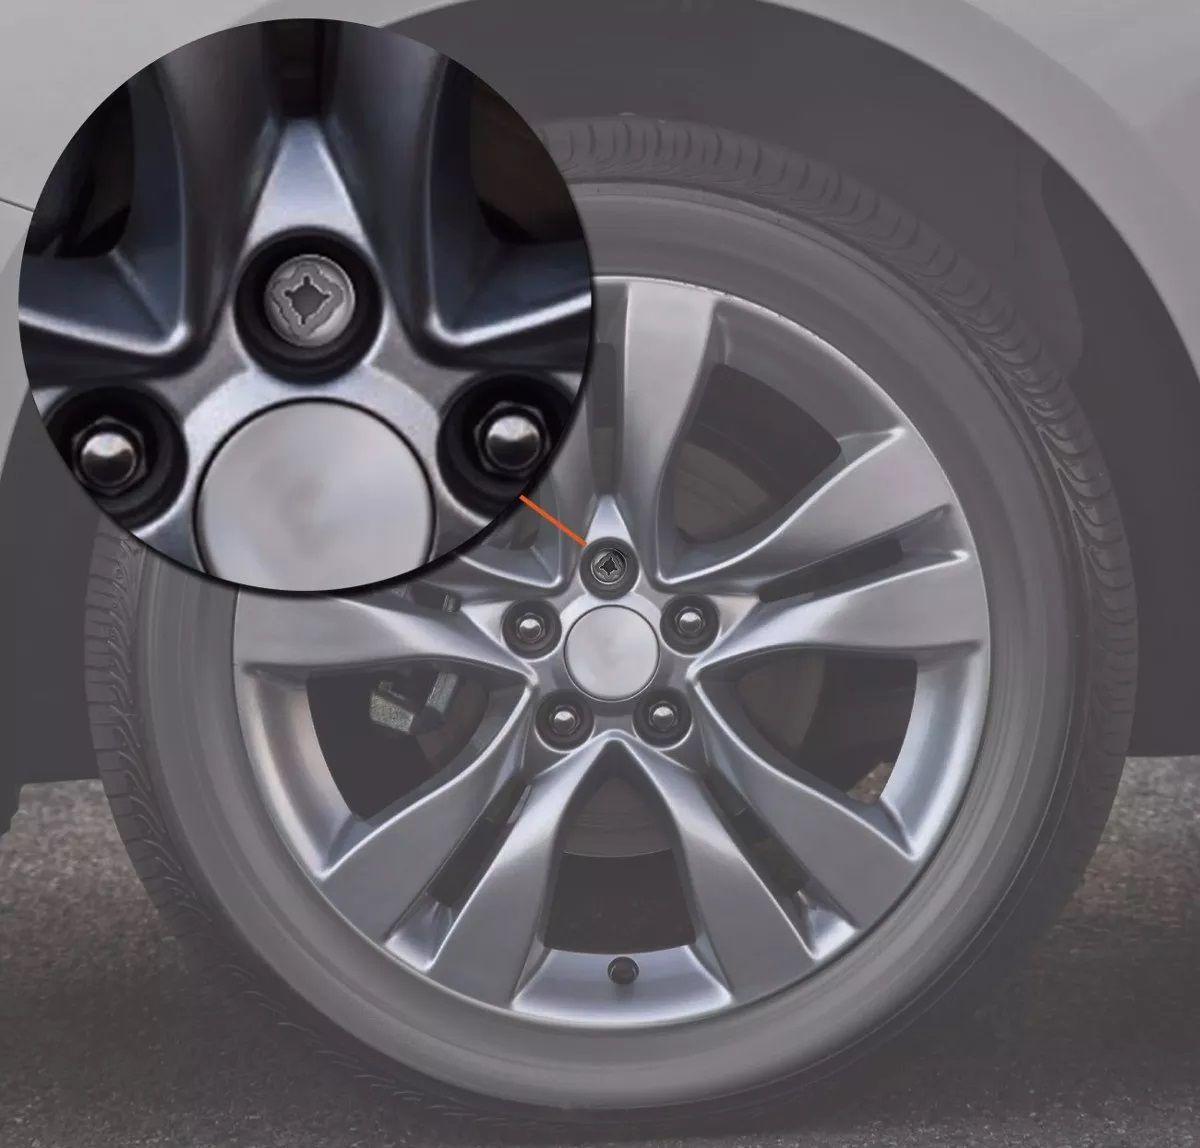 Kit 4 Parafusos De Roda Antifurto Peugeot Citroen Renegade Toro Compass